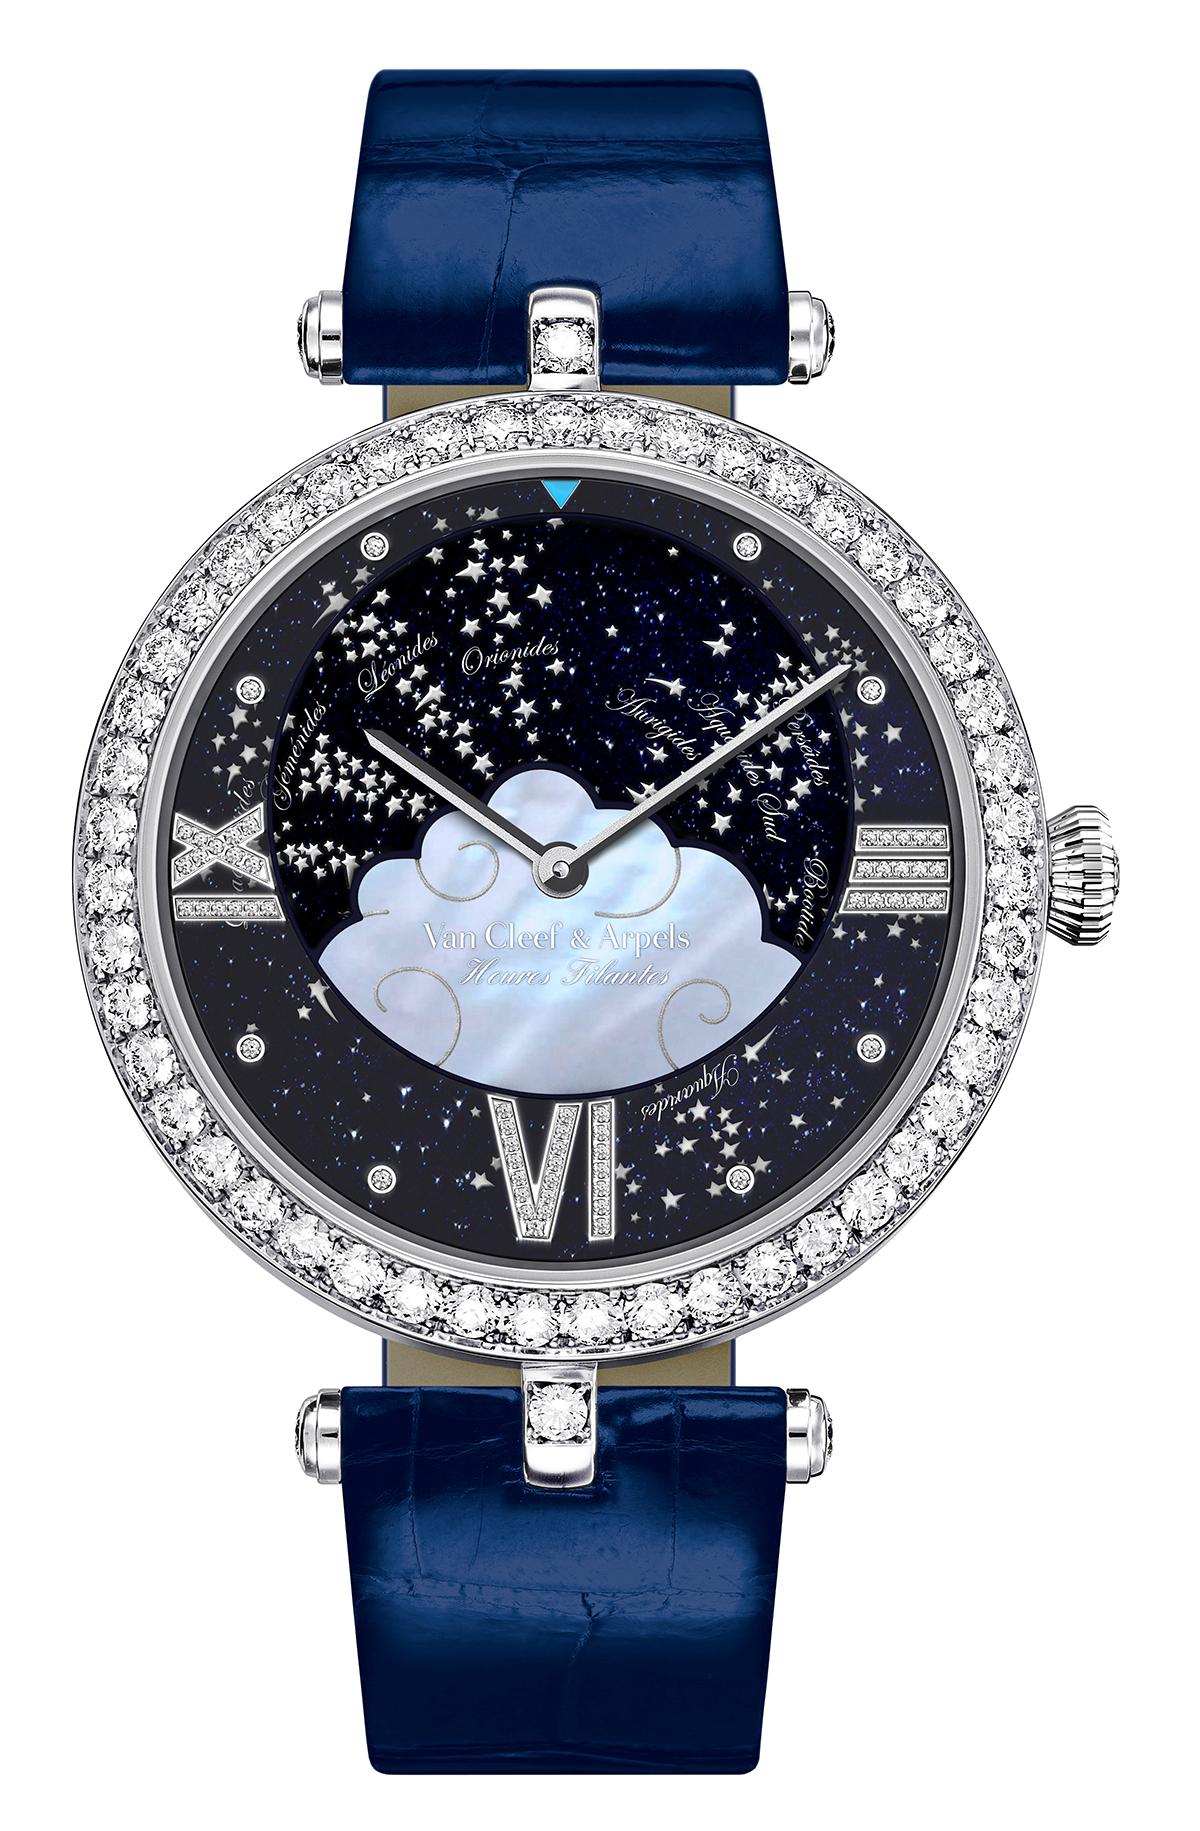 van cleef arpels a watch that measures good luck time transformed. Black Bedroom Furniture Sets. Home Design Ideas